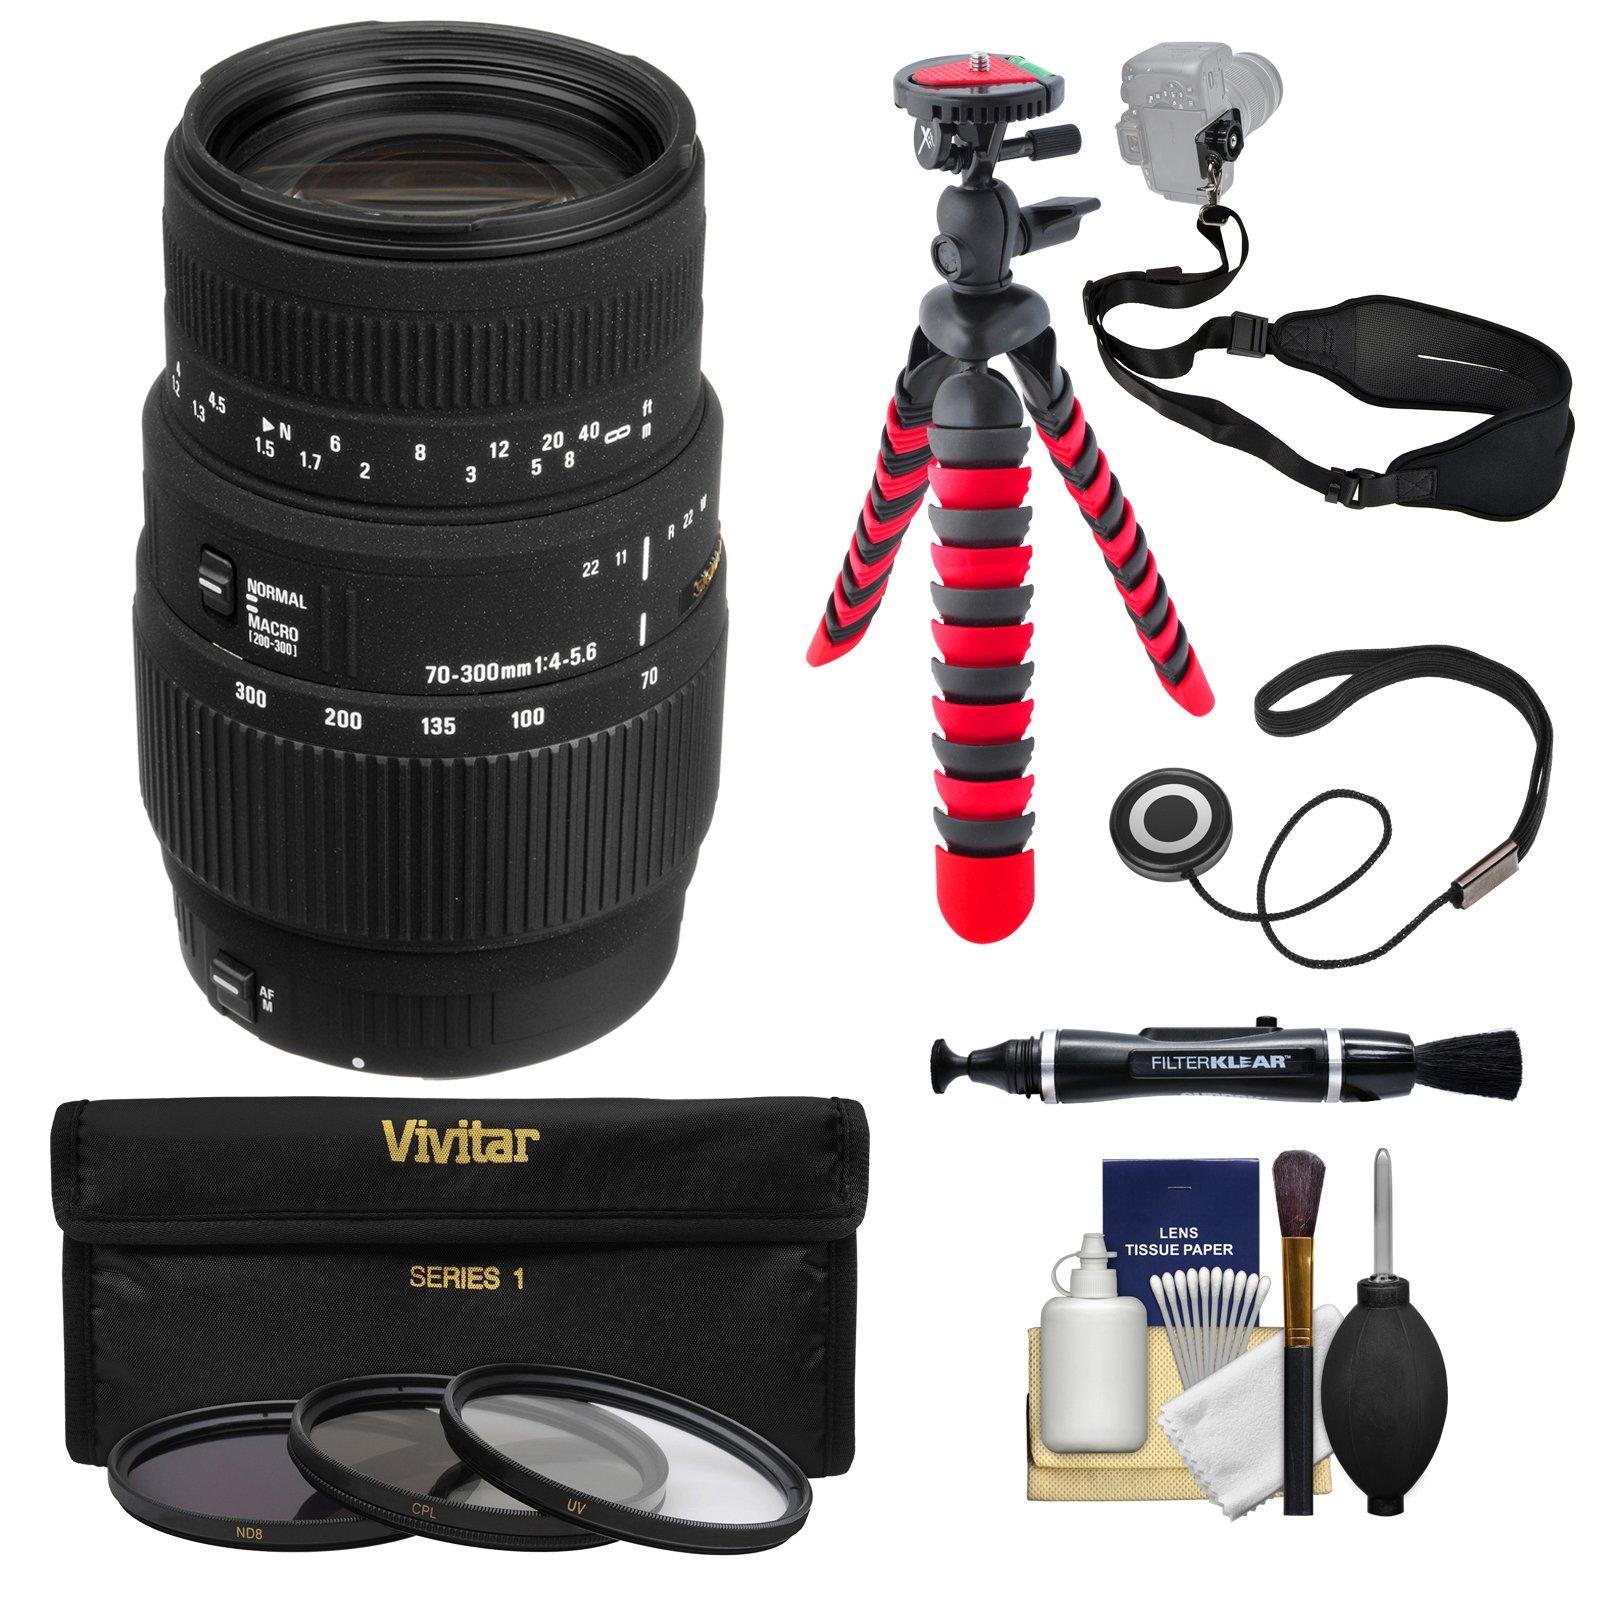 Sigma 70-300mm f/4-5.6 DG Motorized Macro Zoom Lens with Tripod + Filter + Strap + Kit for Nikon Digital SLR Cameras by Sigma (Image #1)